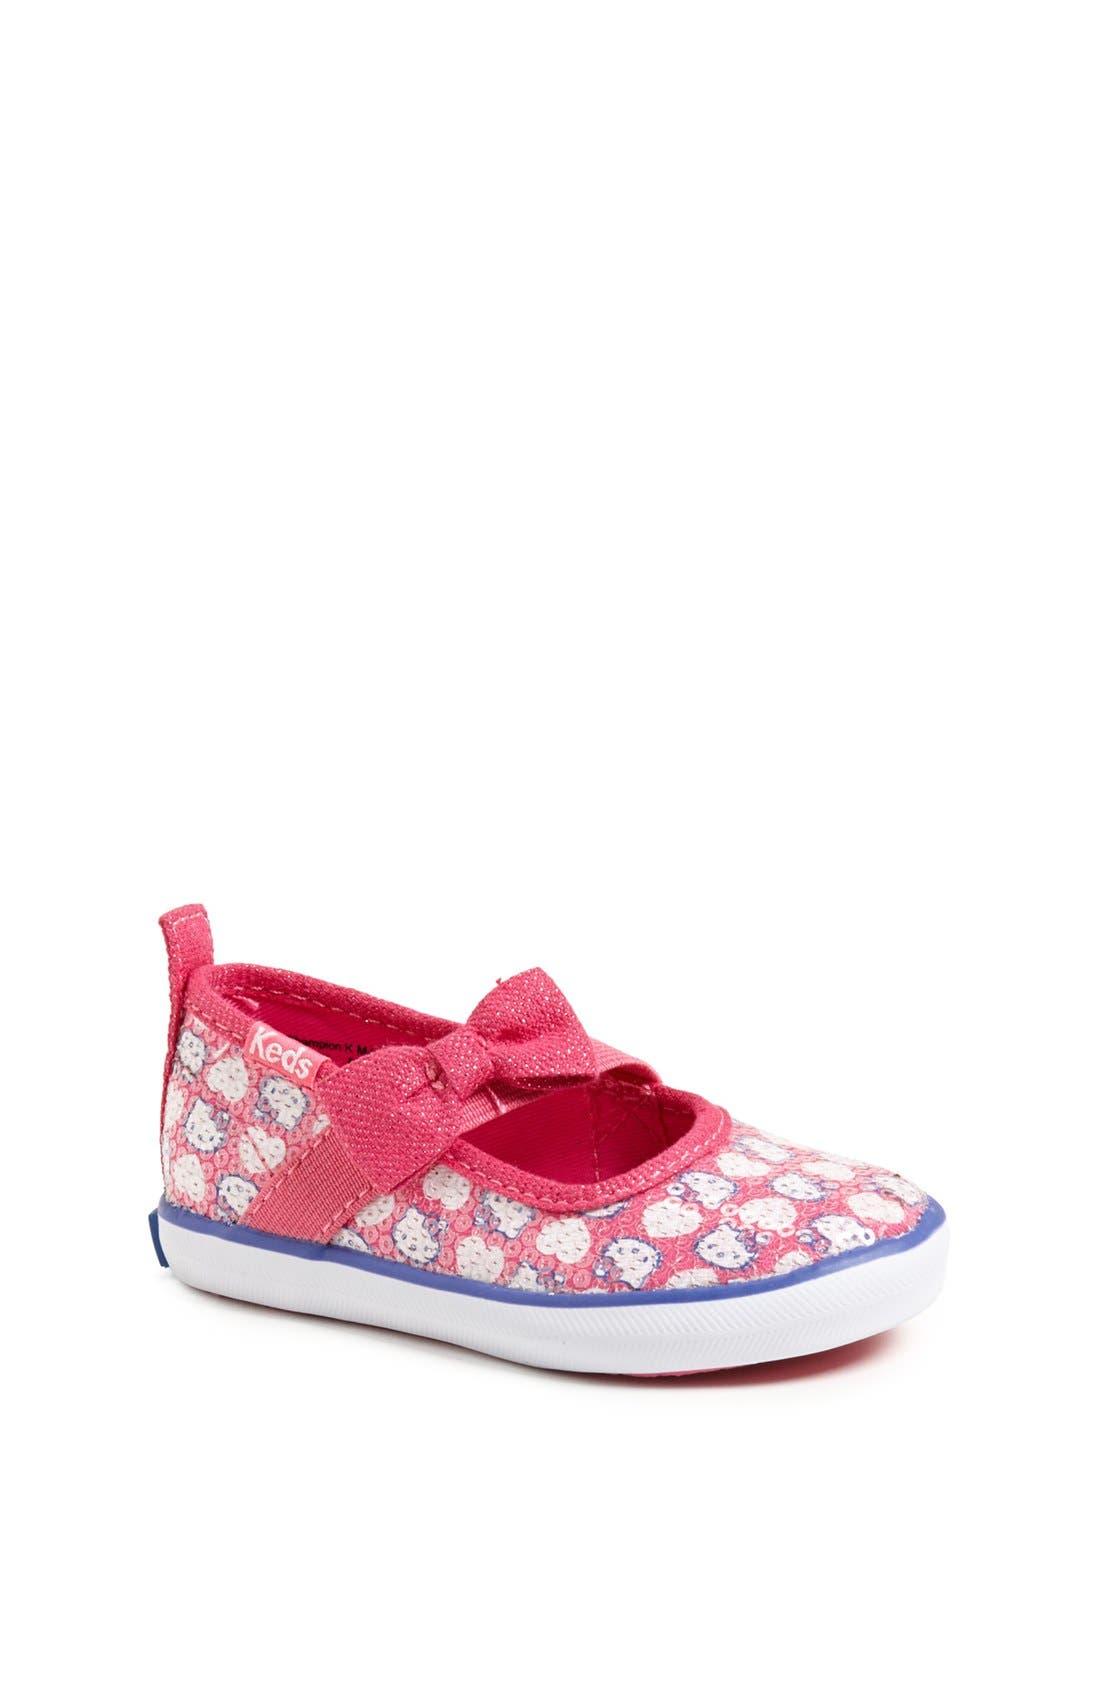 Main Image - Keds® 'Champion - Hello Kitty®' Sneaker (Walker & Toddler)